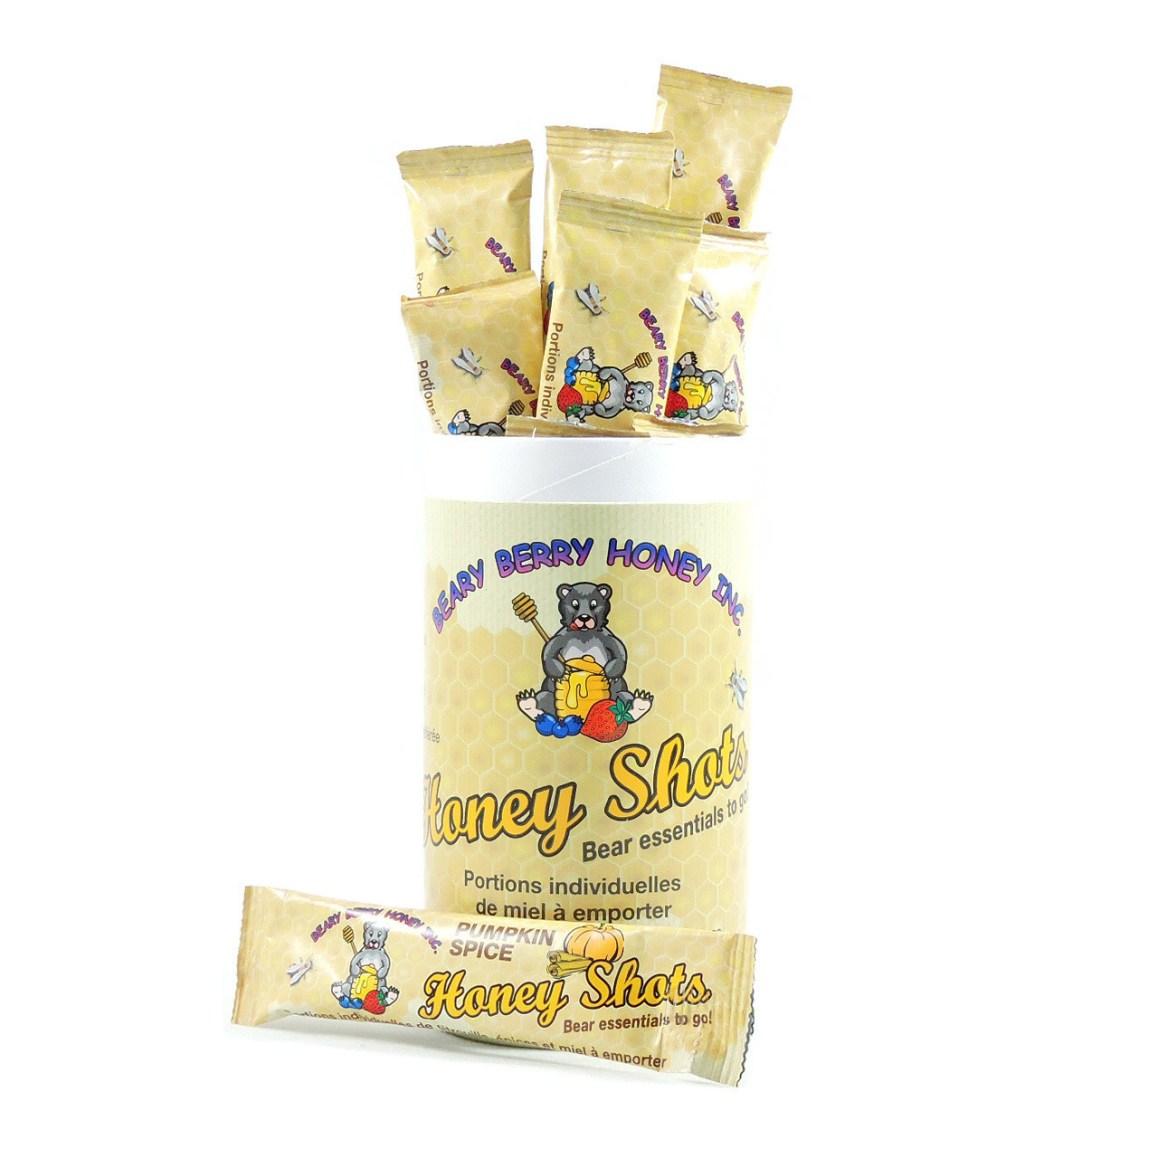 Assorted Honey Shots